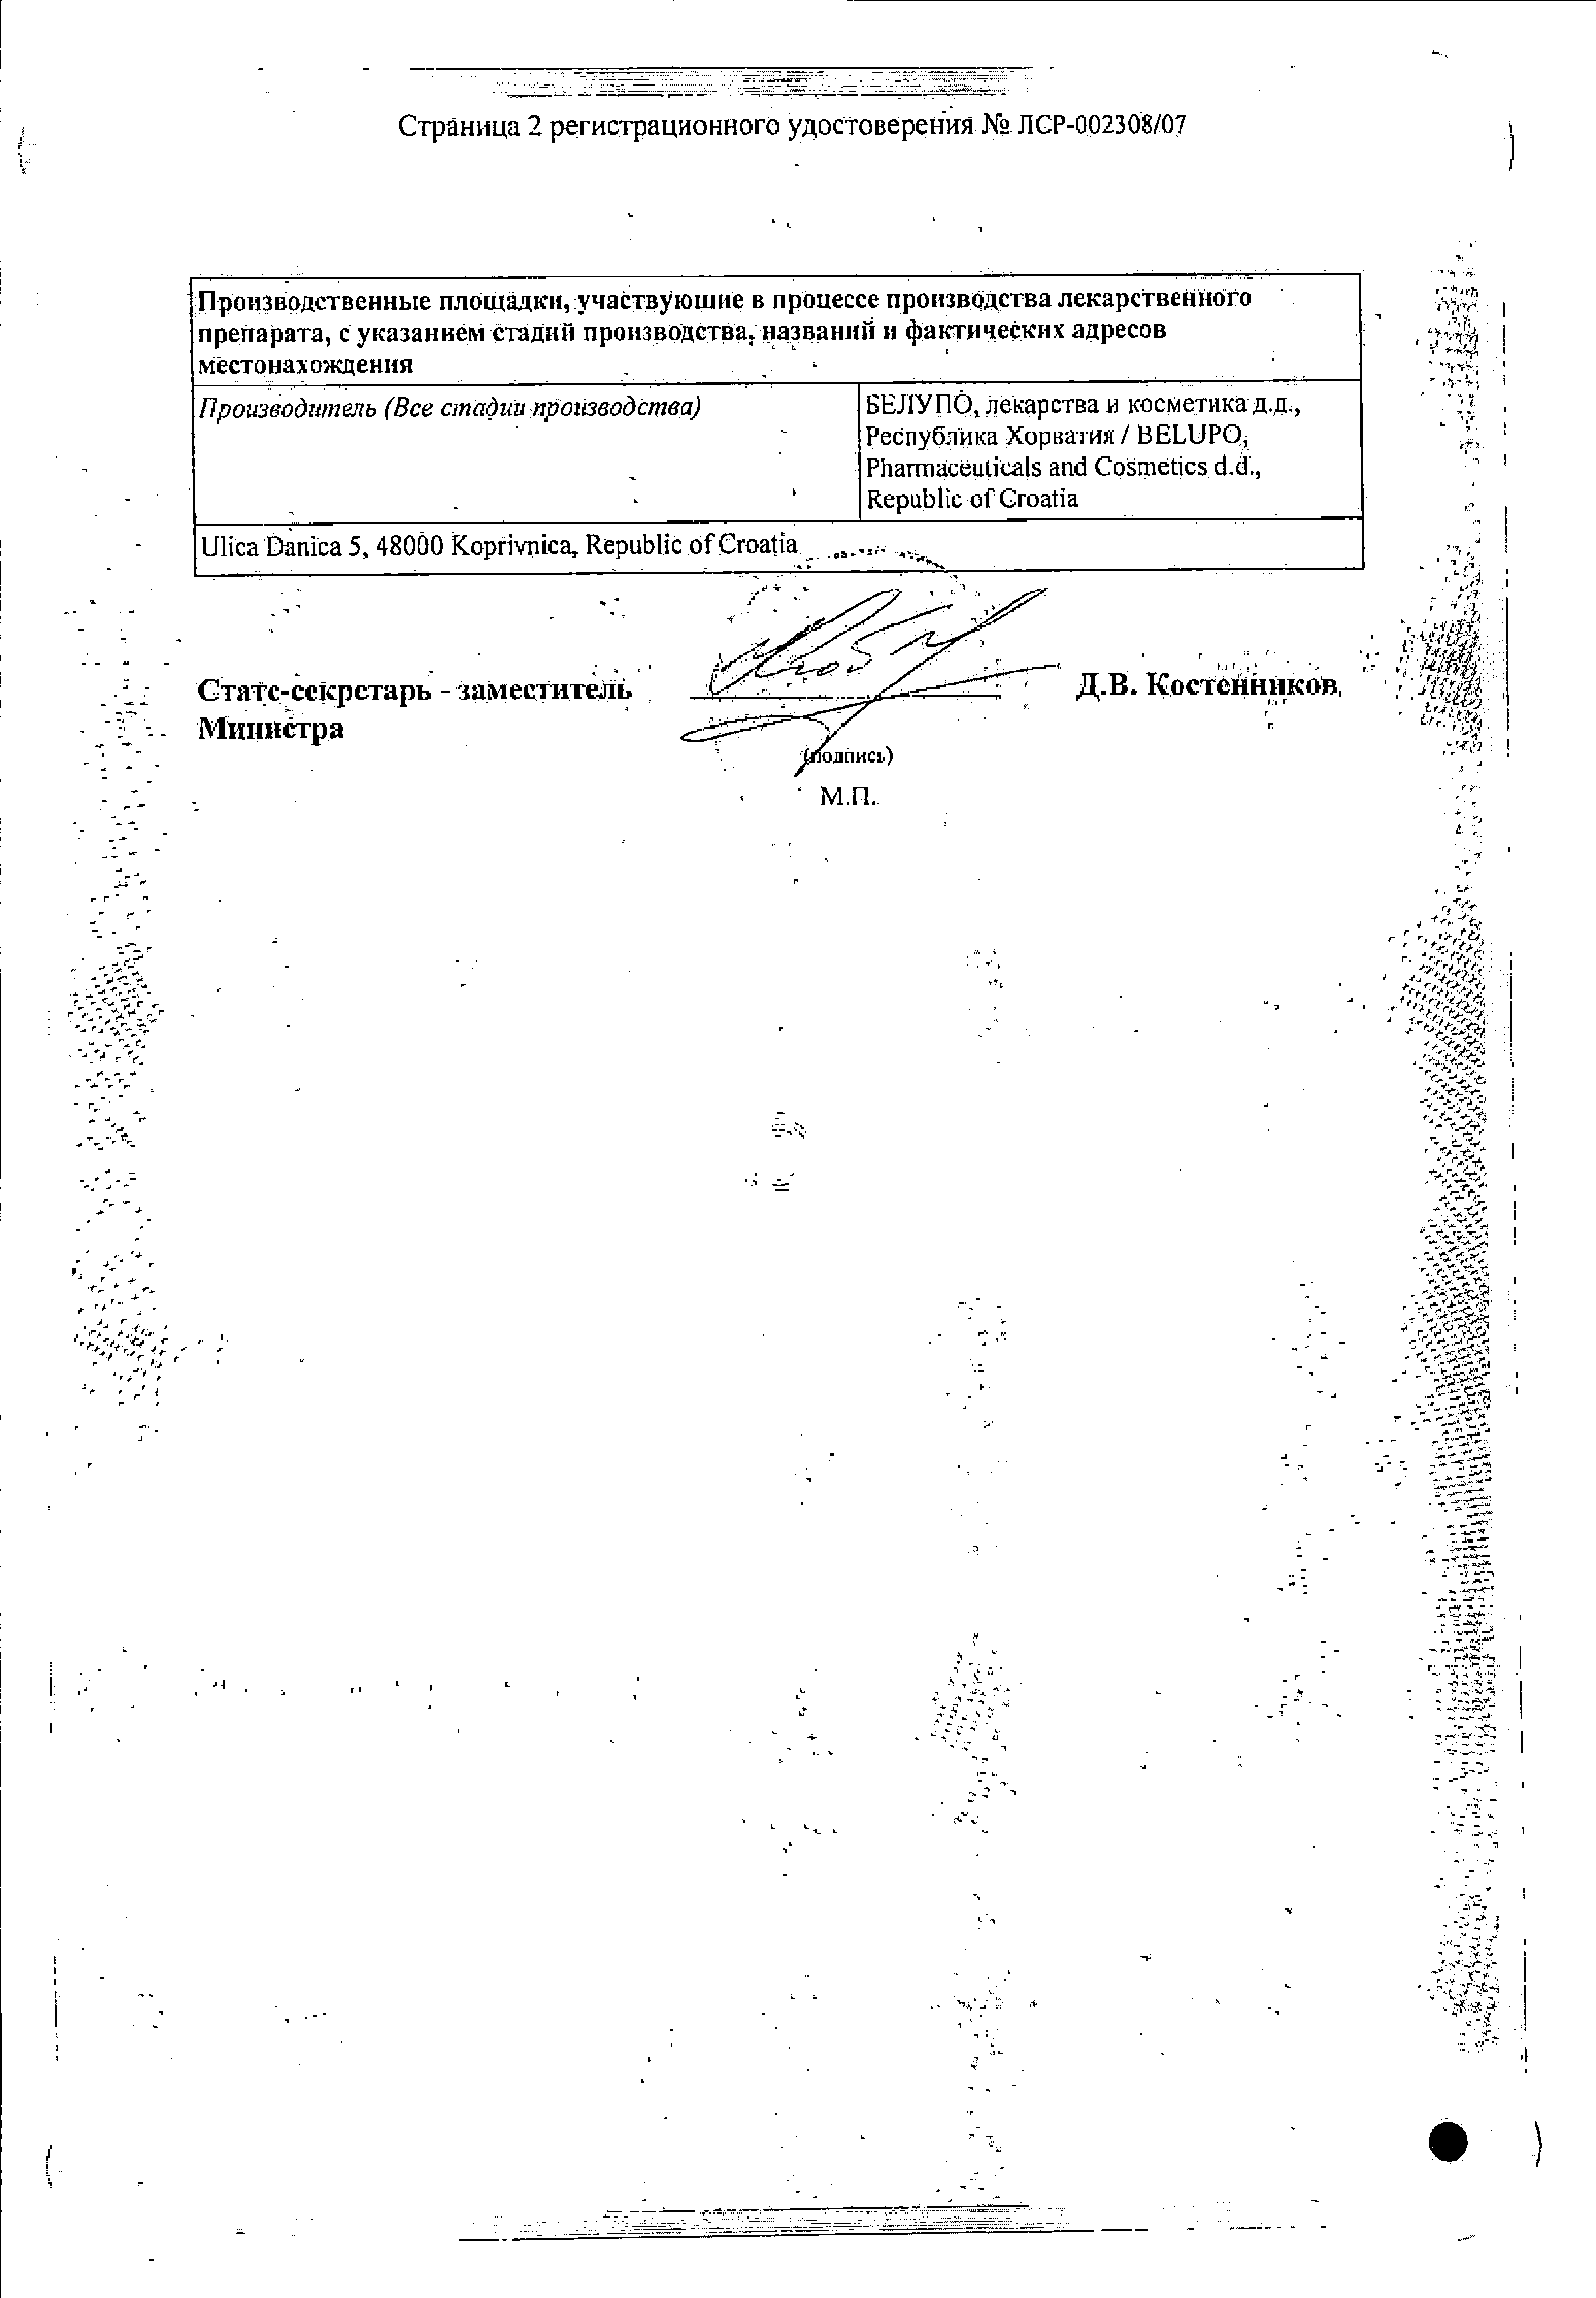 Ирузид сертификат